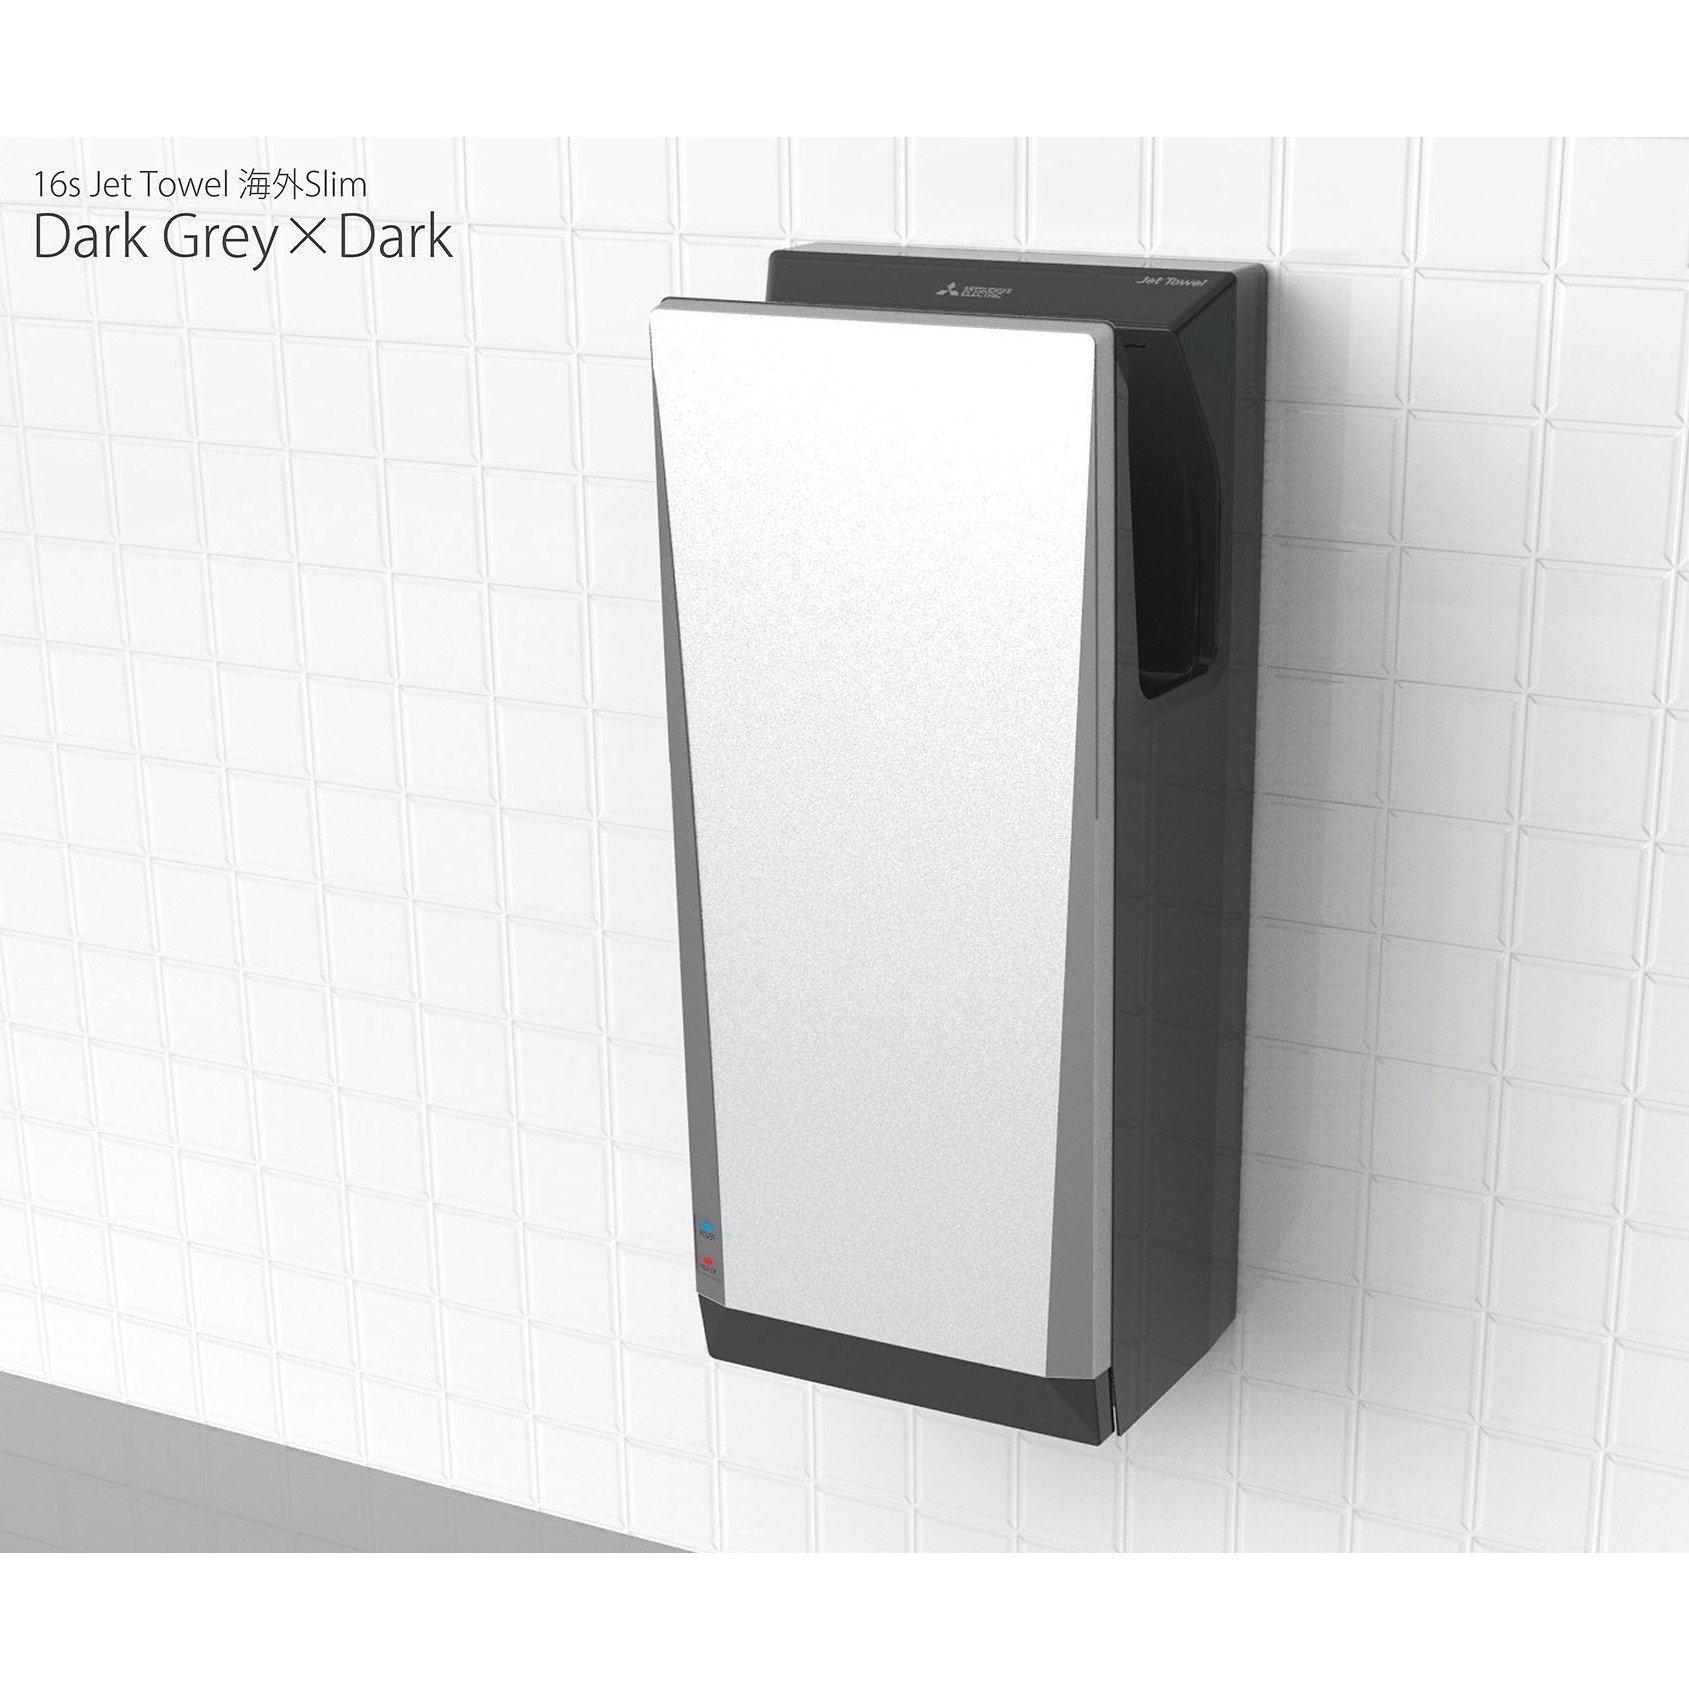 veltia airblade ni dryer hand new black hygiene services triblade washroom dyson mitsubishi